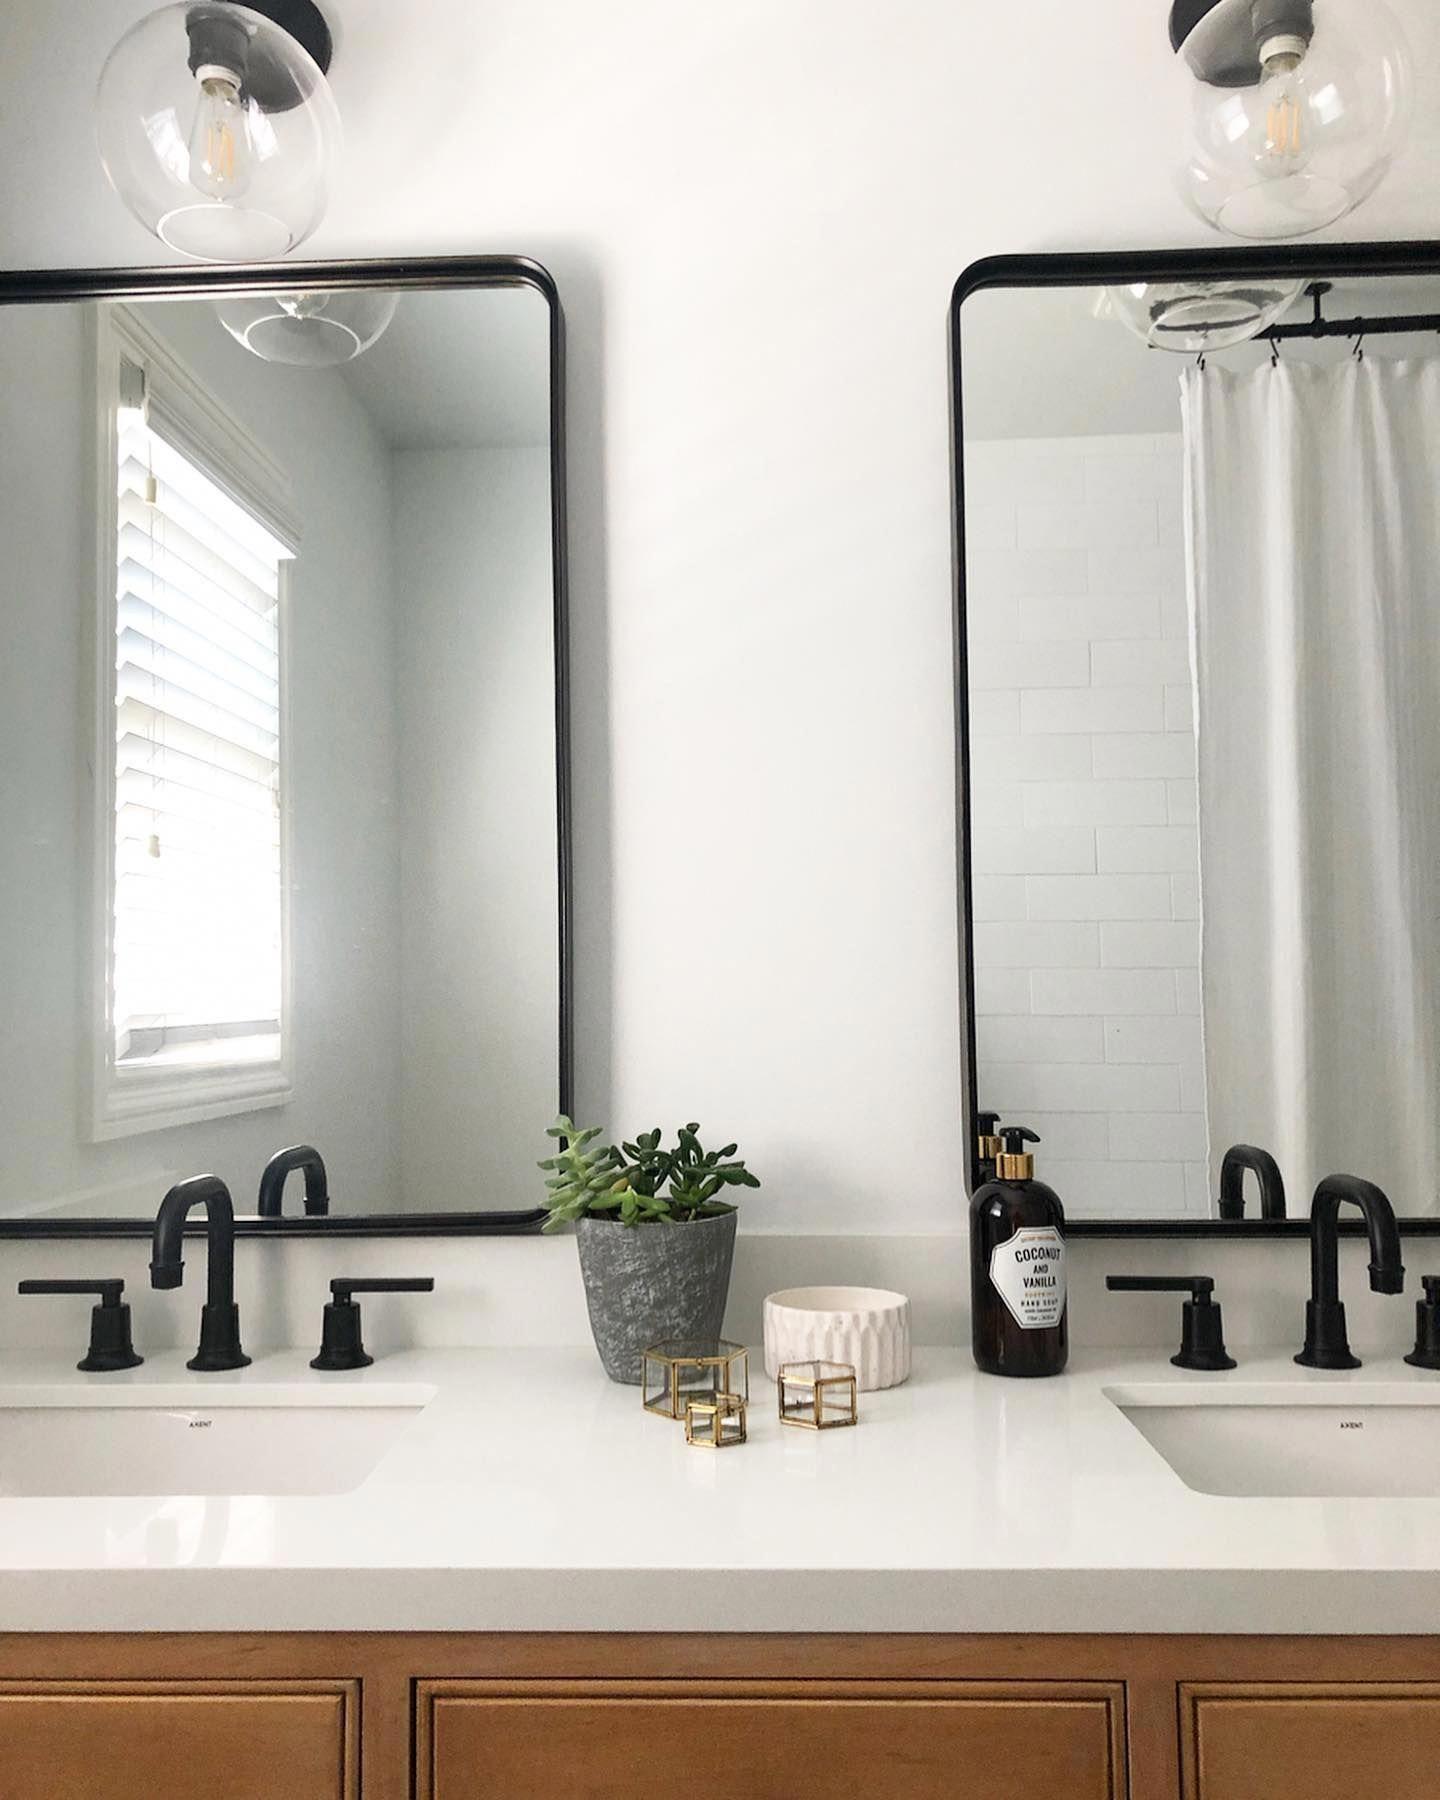 10 Bathromm Ideas Styles Decorating Ideas Bathroom Interior Design Framed Bathroom Mirror Bathroom Design